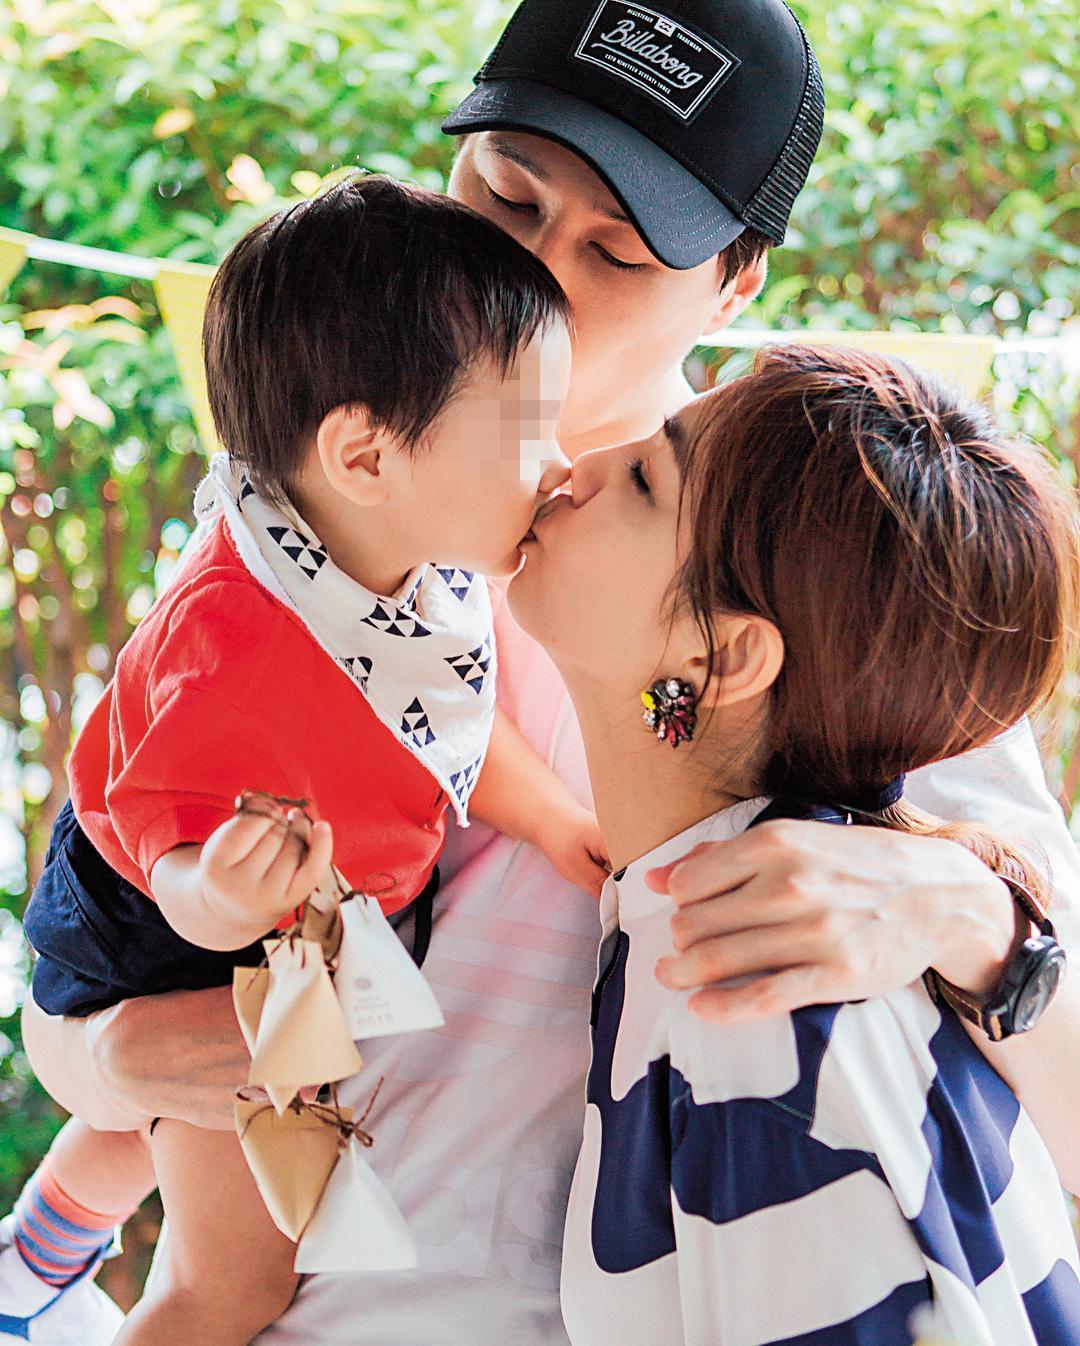 Ella日前辦37歲生日趴,老公賴斯翔(中)為她準備生日驚喜,由兒子勁寶(左)獻吻,一家3口和樂融融。(翻攝自Ella IG)